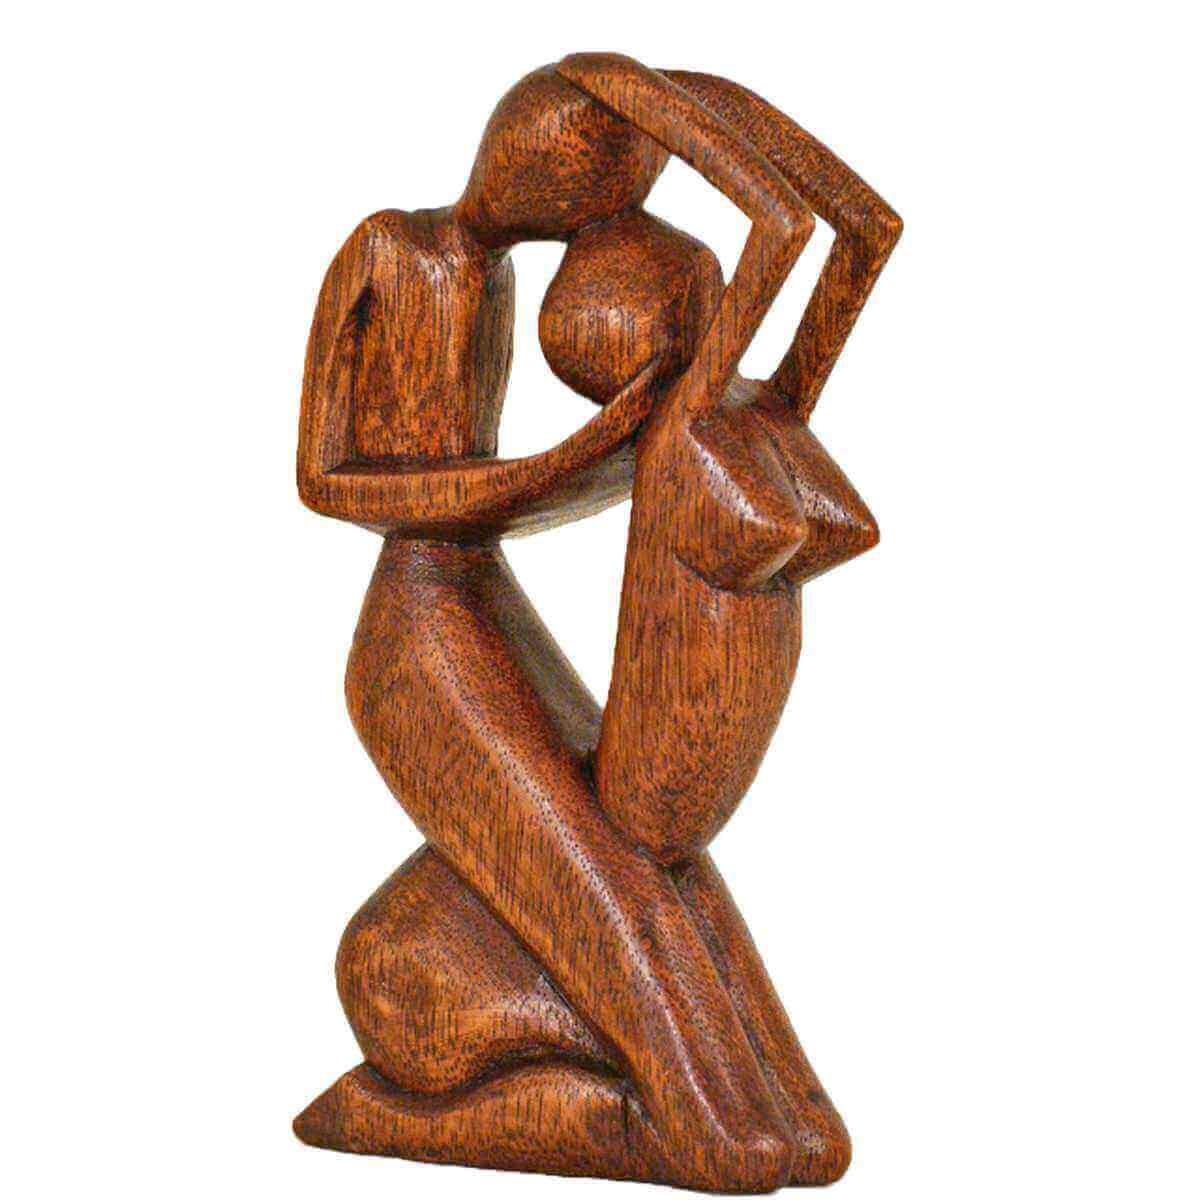 estatuilla de madera figura madera abstracta escultura pasin de frica asia mano trabajo decoracin